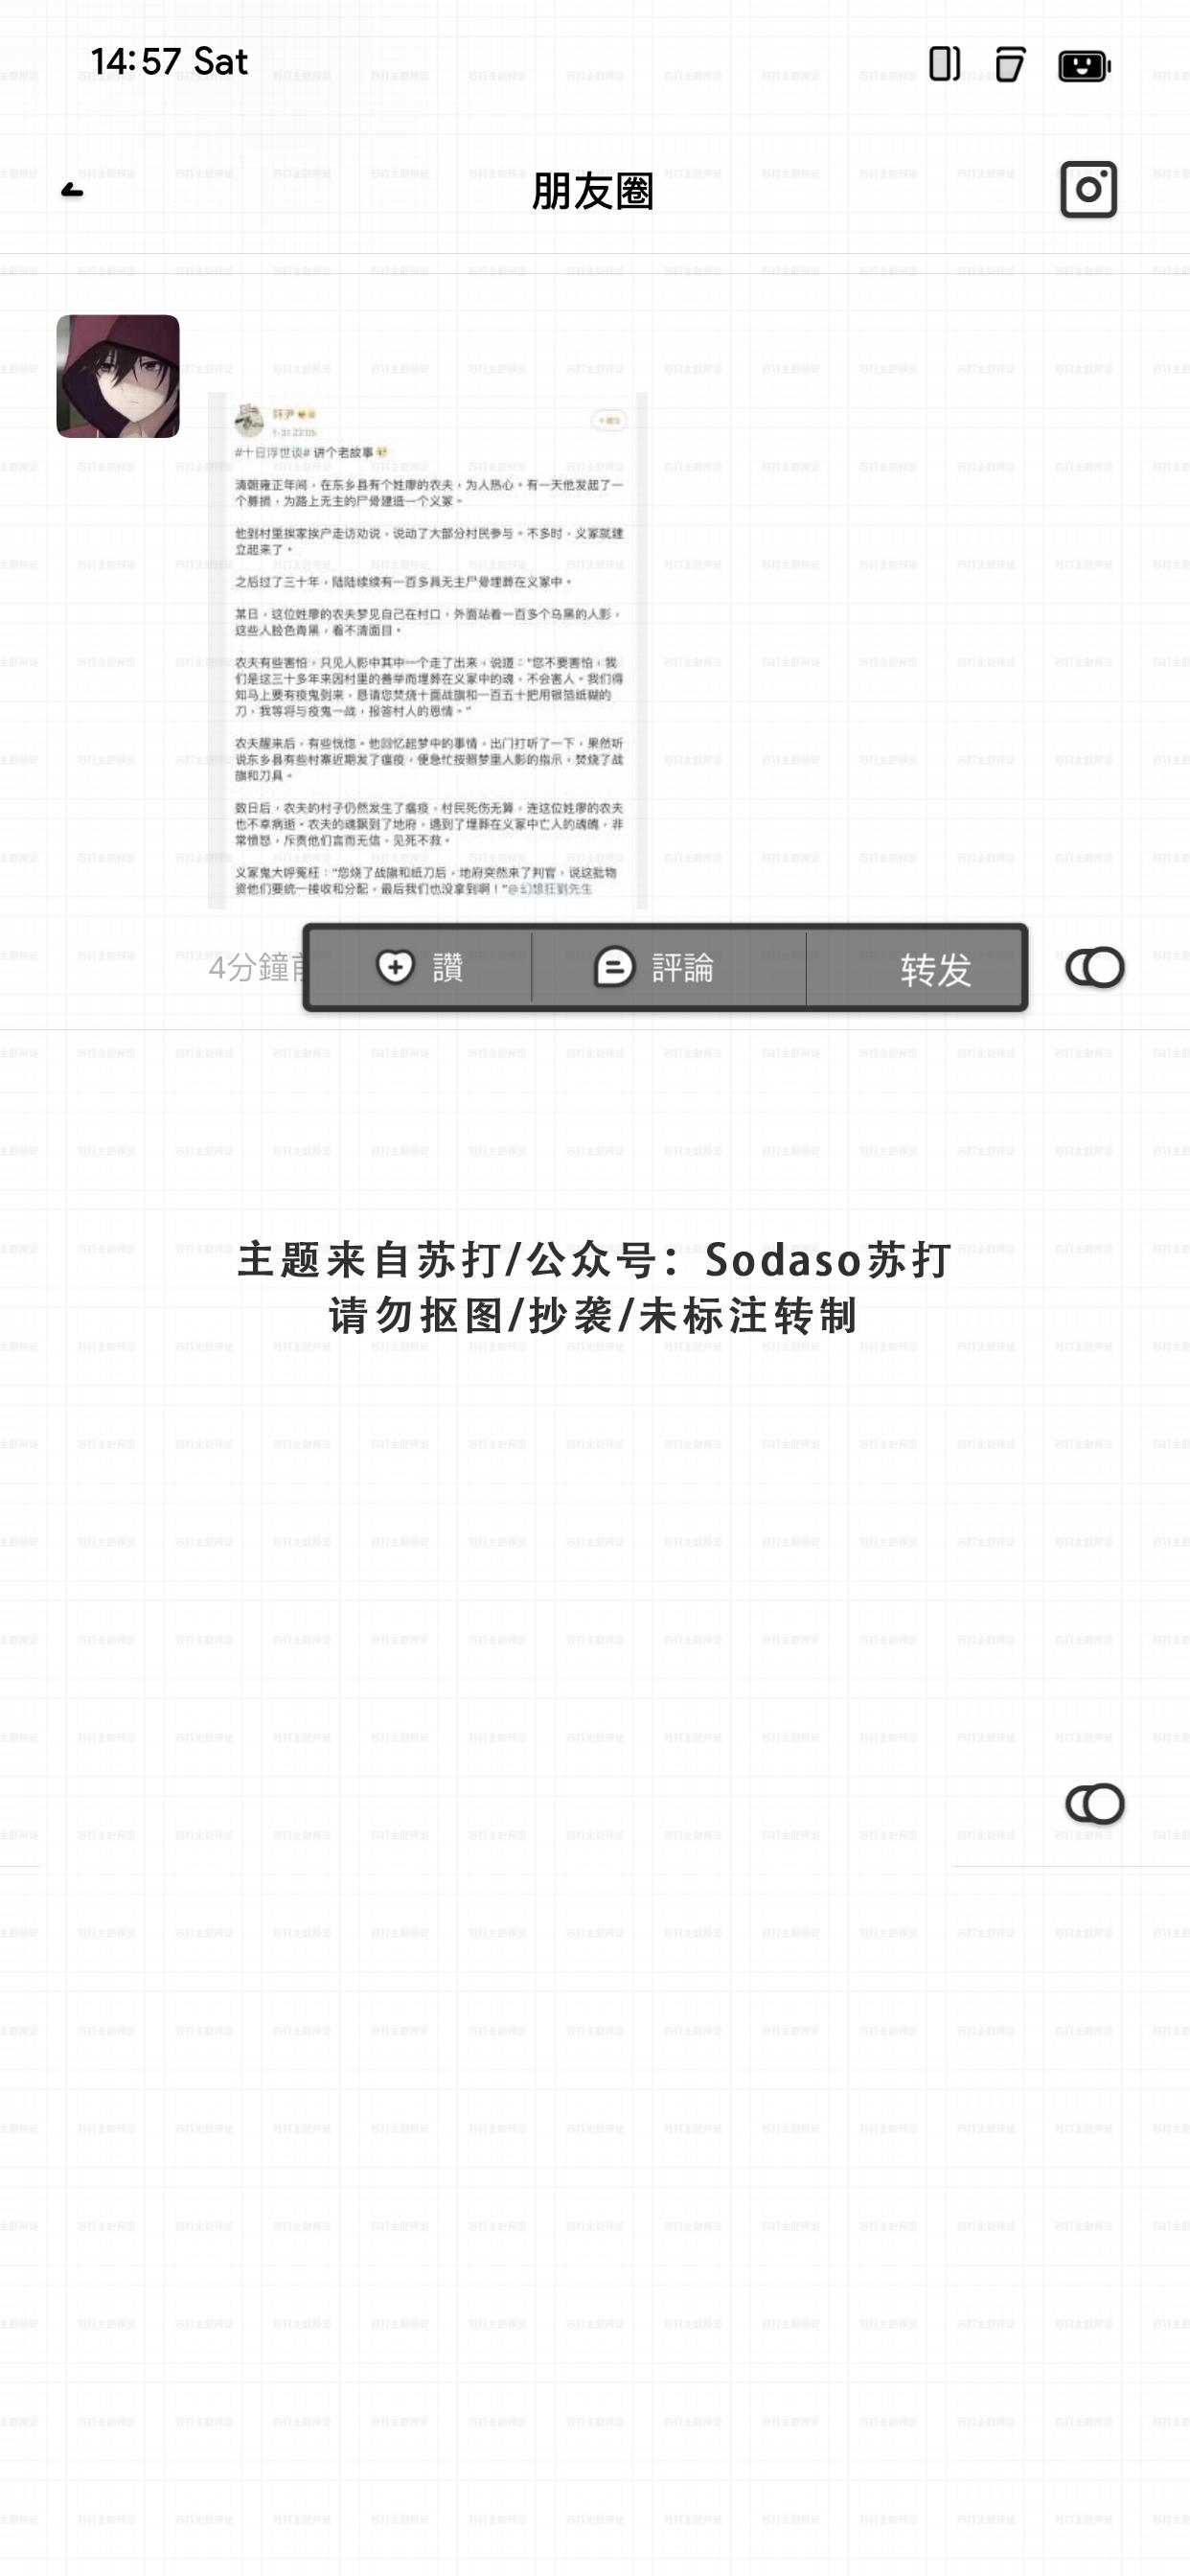 Fries WeChatTheme(微信主题) - 2.1